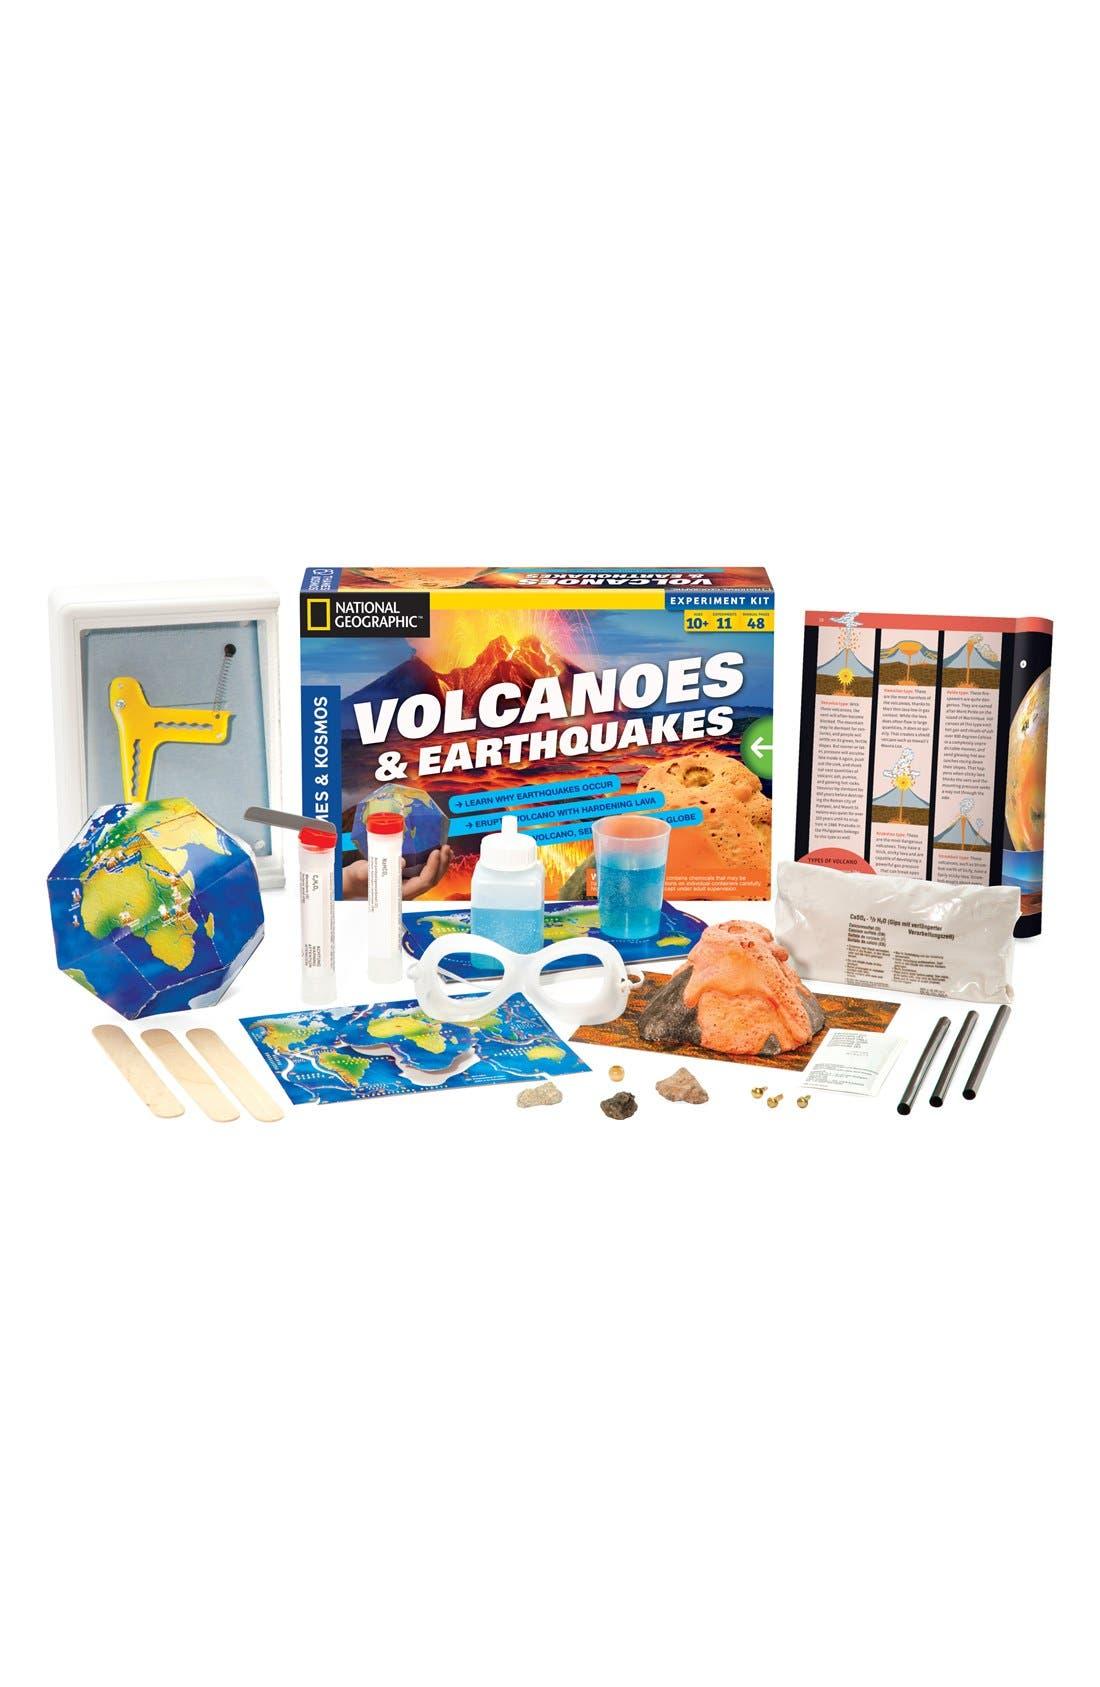 Main Image - Thames & Kosmos 'Volcanoes & Earthquakes' Experiment Kit